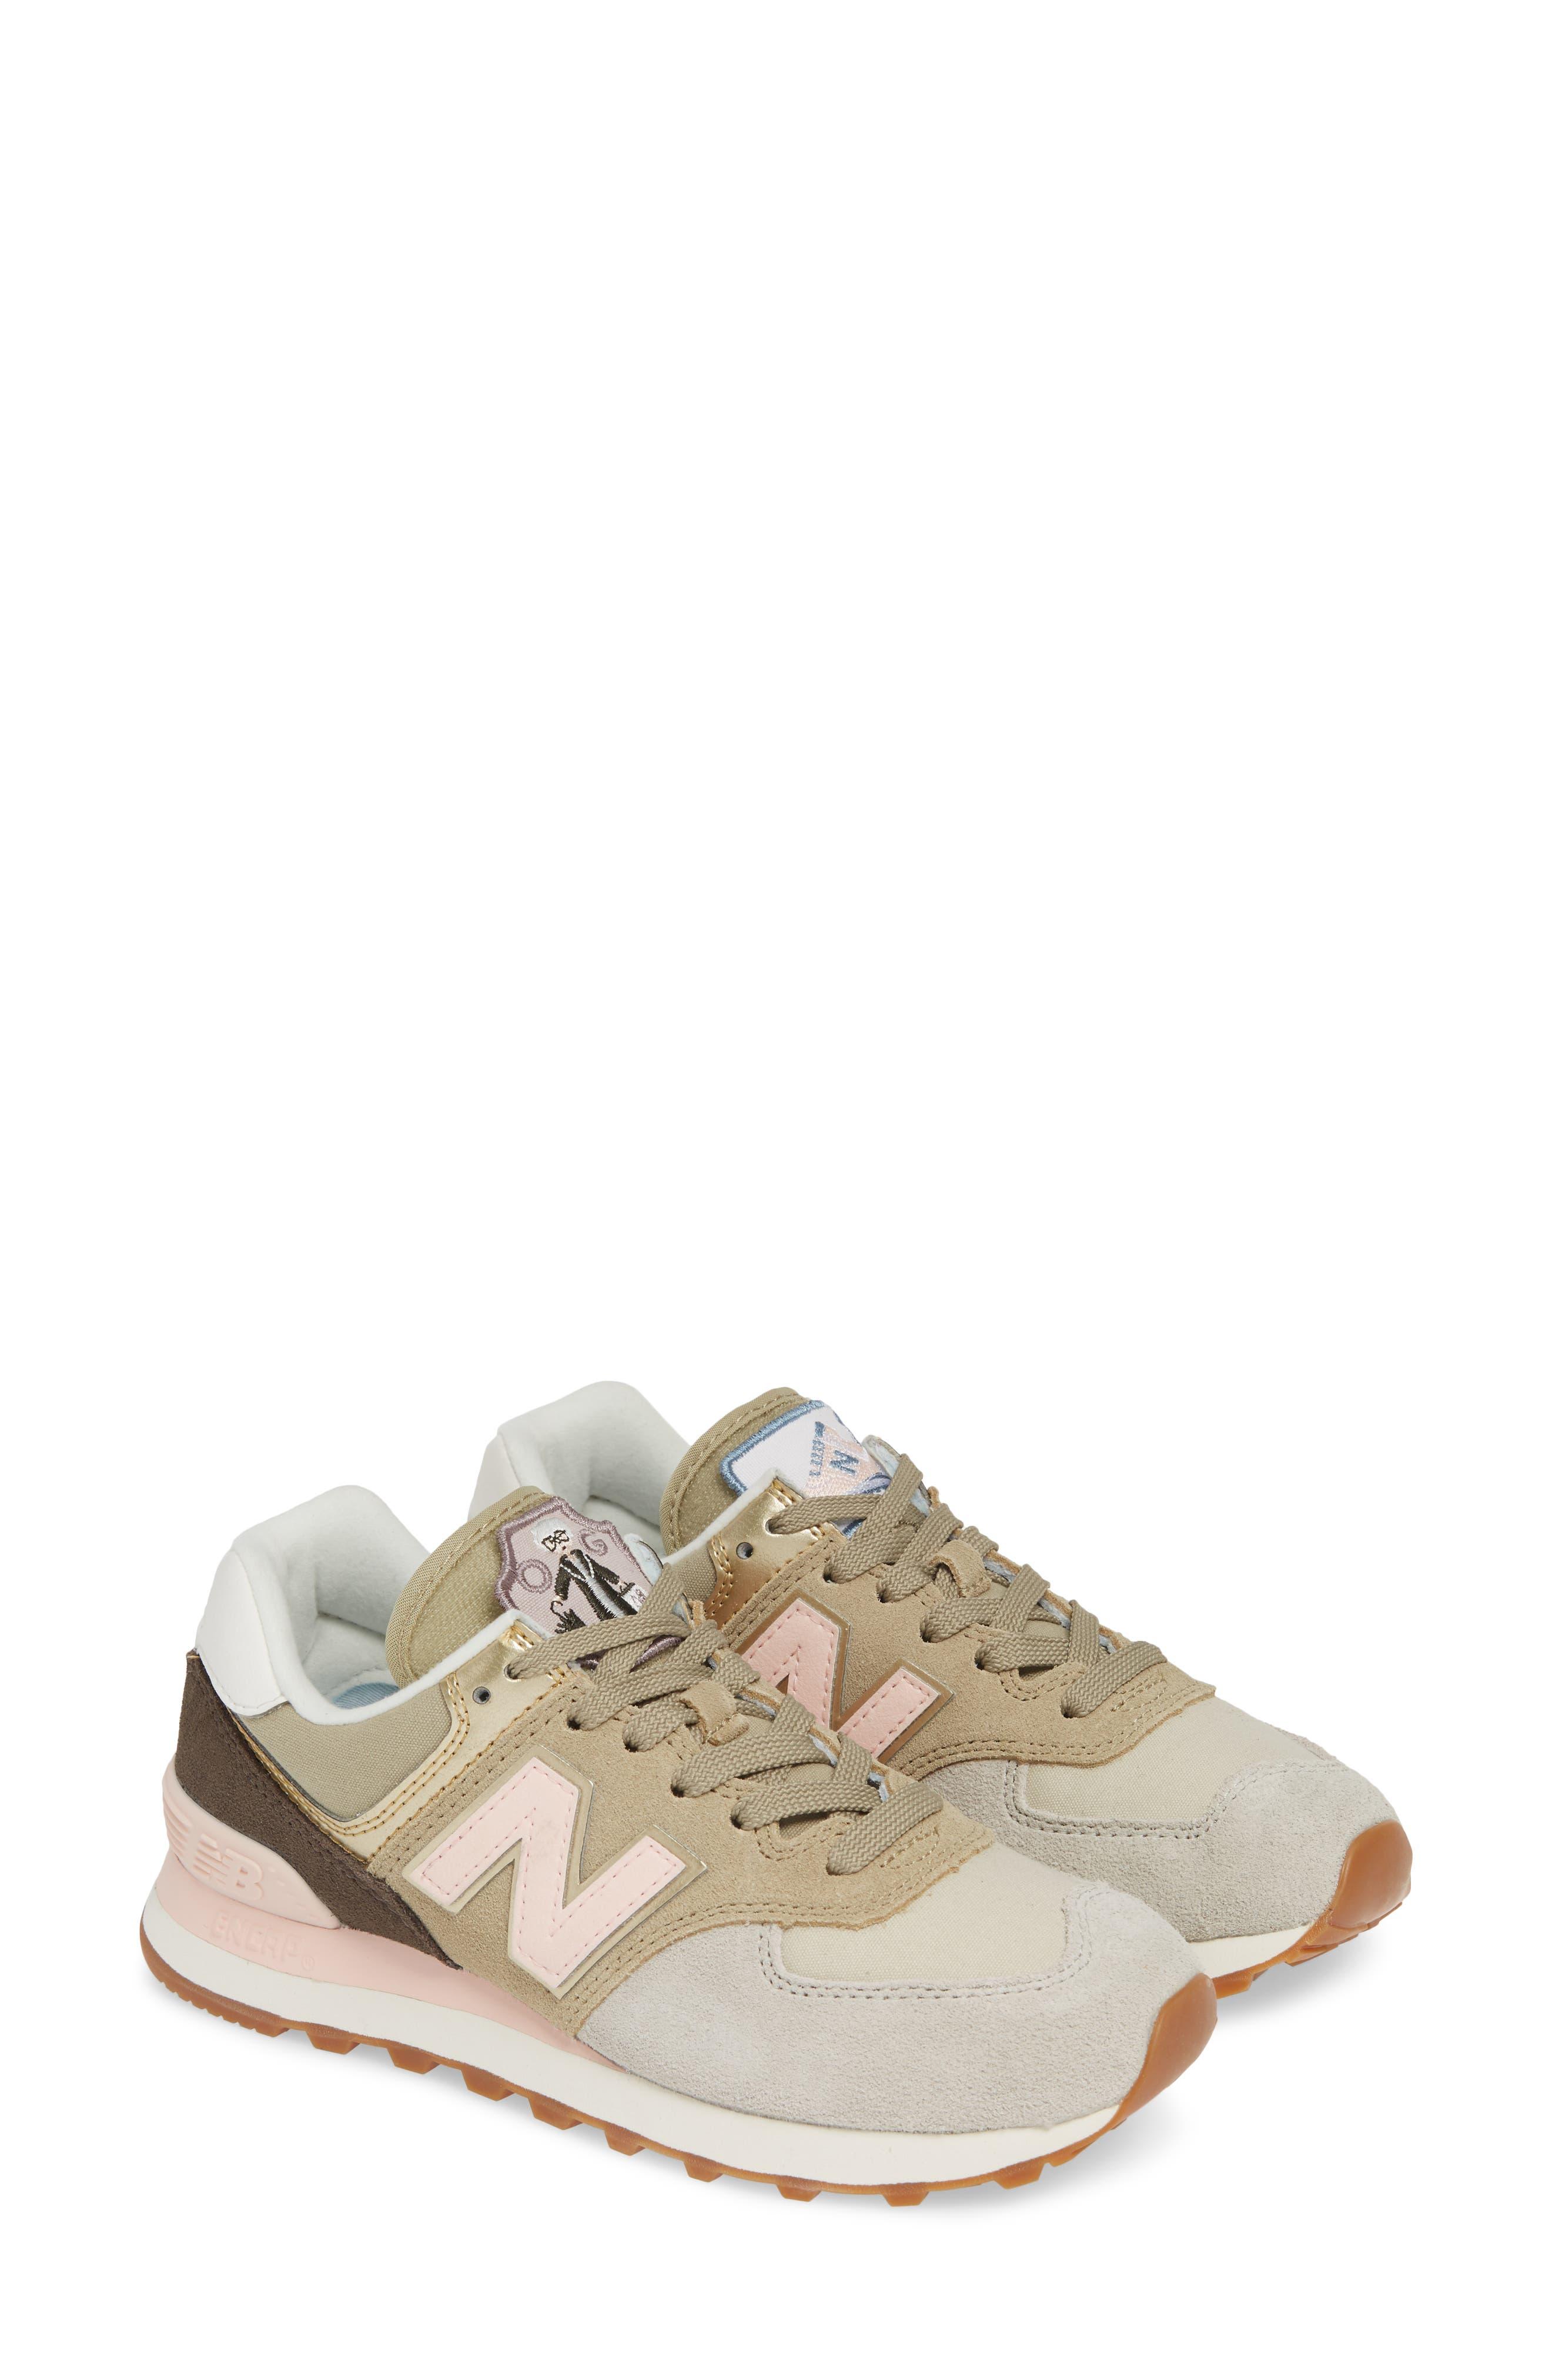 NEW BALANCE, 574 Metallic Patch Sneaker, Main thumbnail 1, color, LIGHT CLIFF GREY